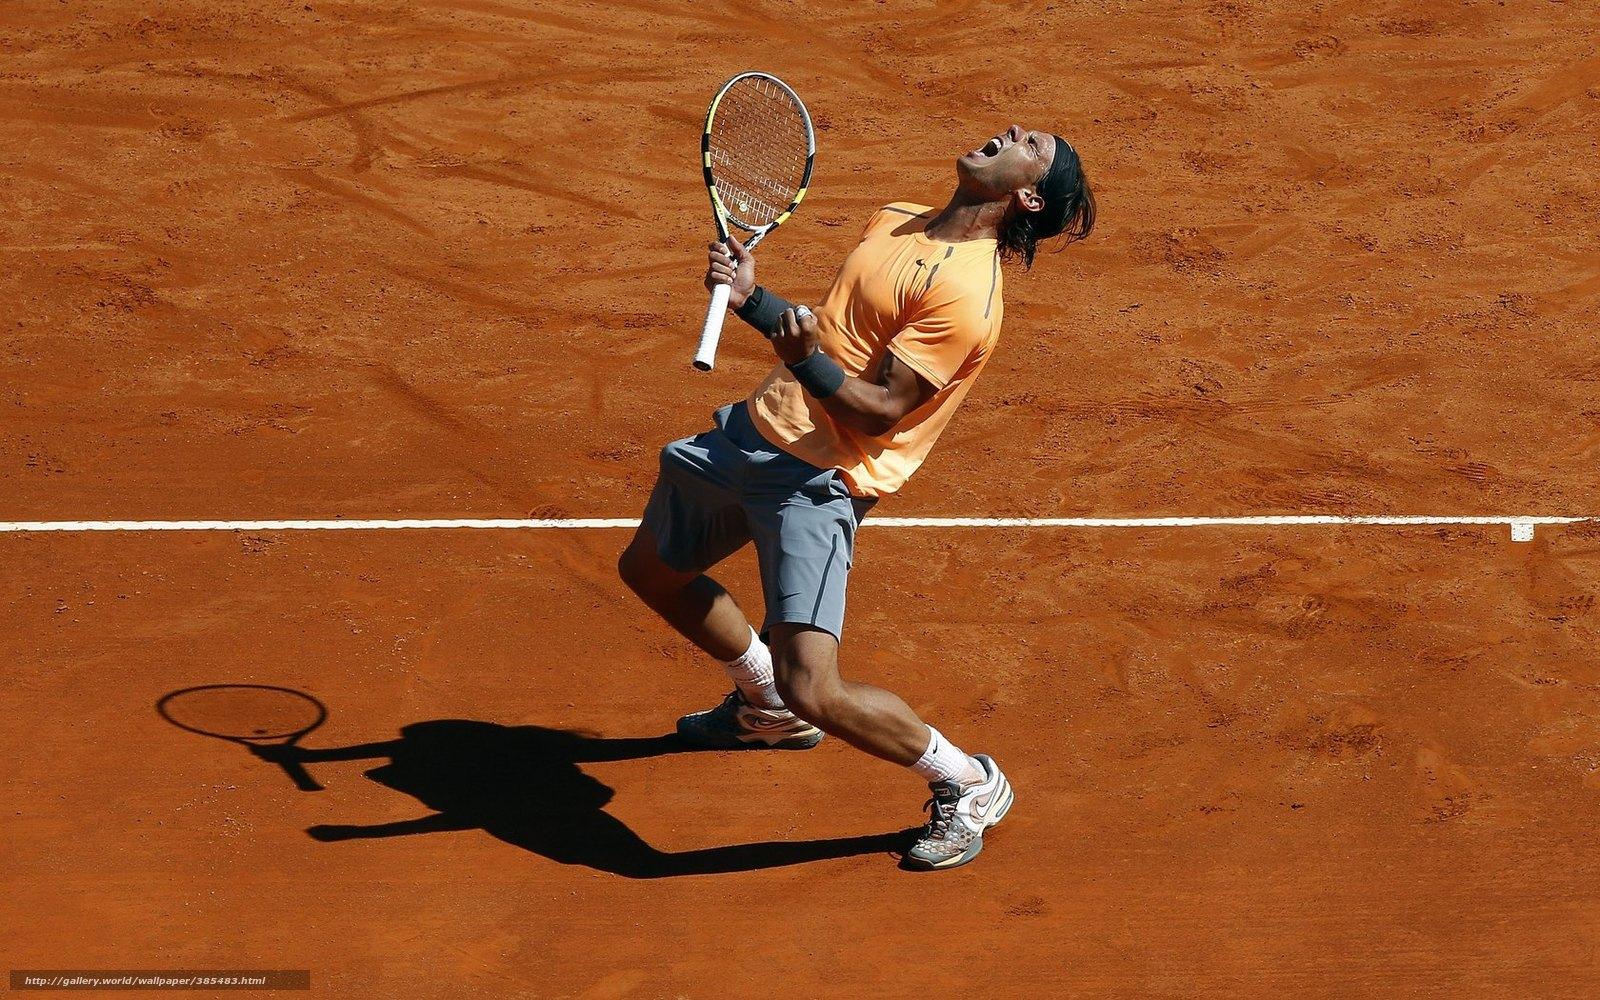 Download Wallpaper Rafael Nadal Tennis Free Desktop Wallpaper In The Resolution 1680x1050 Picture 385483